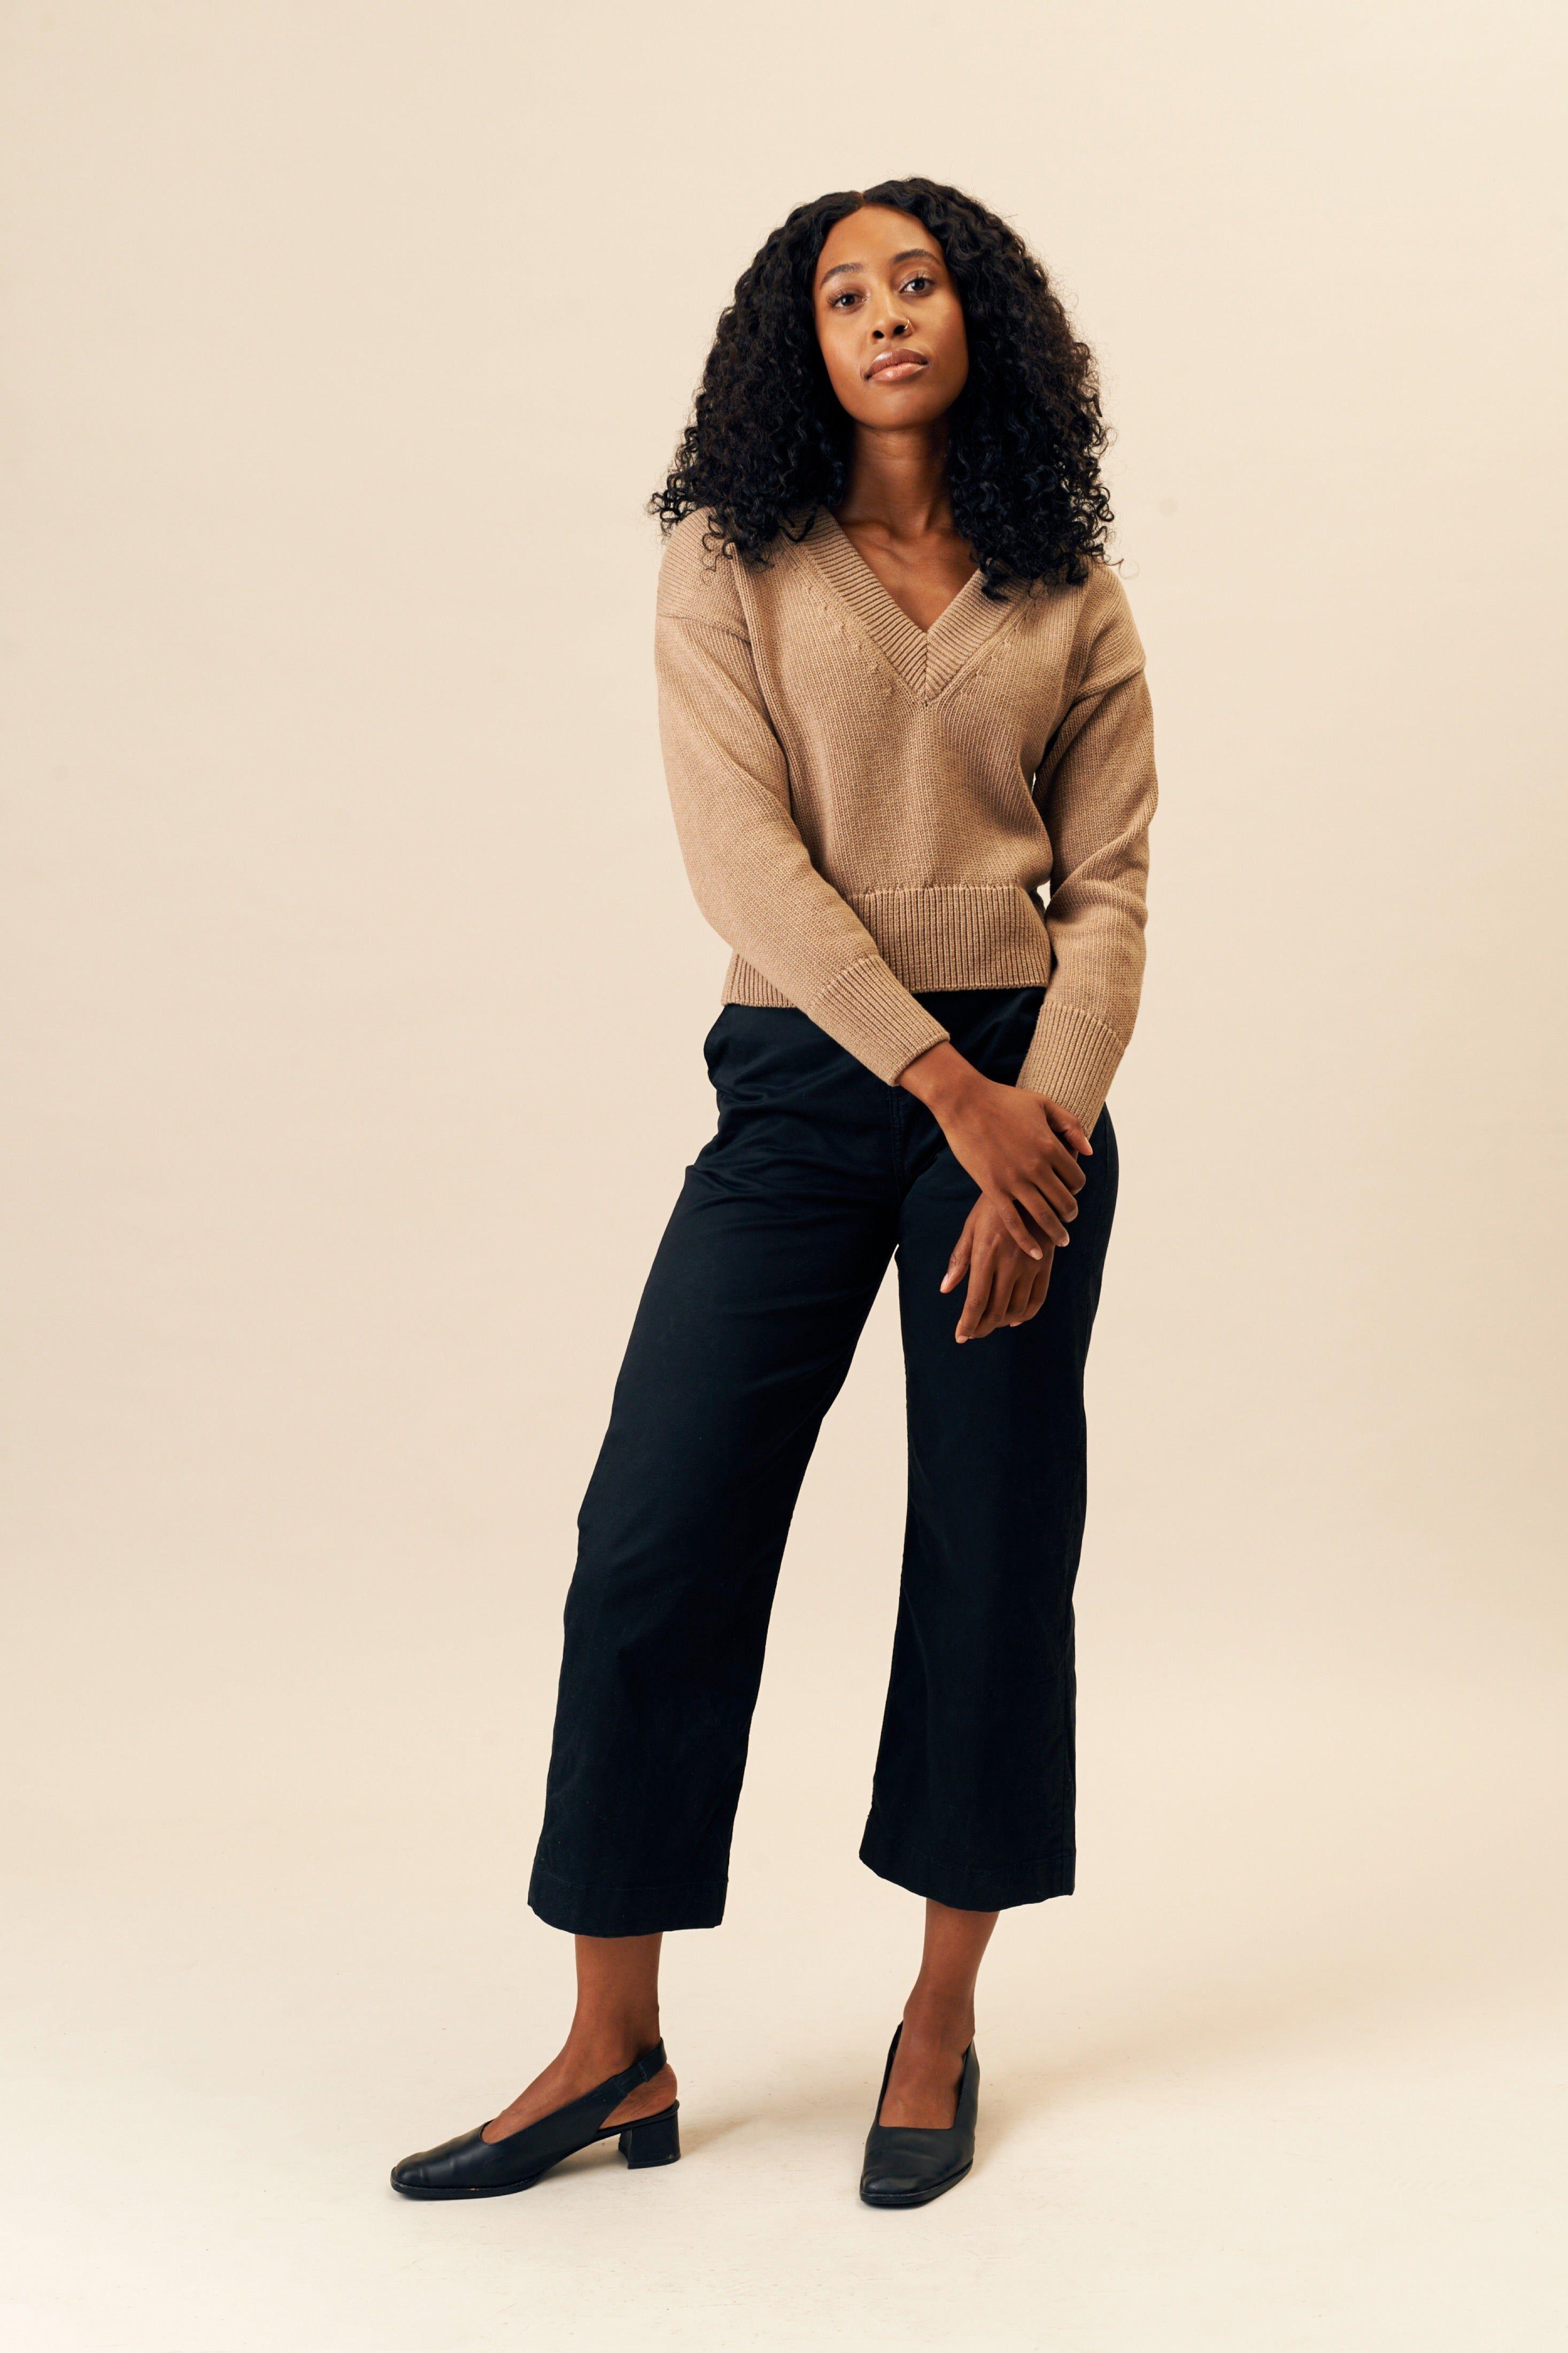 Kotn Women's Deep V-Neck Sweater in Caramel Brown, Size XS